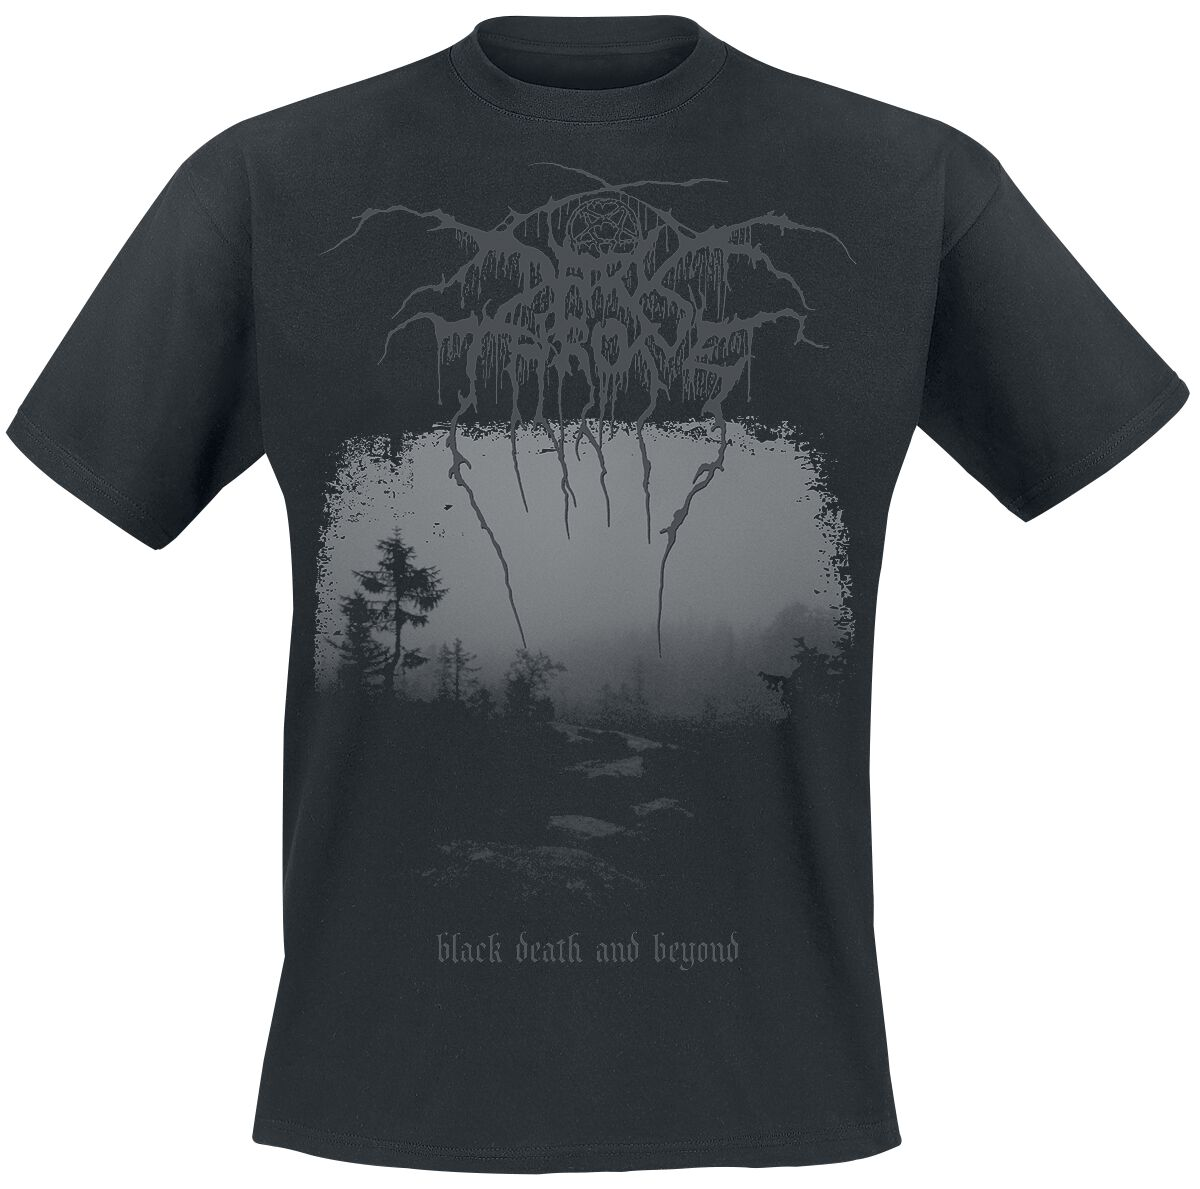 Zespoły - Koszulki - T-Shirt Darkthrone Black death and beyond T-Shirt czarny - 334702